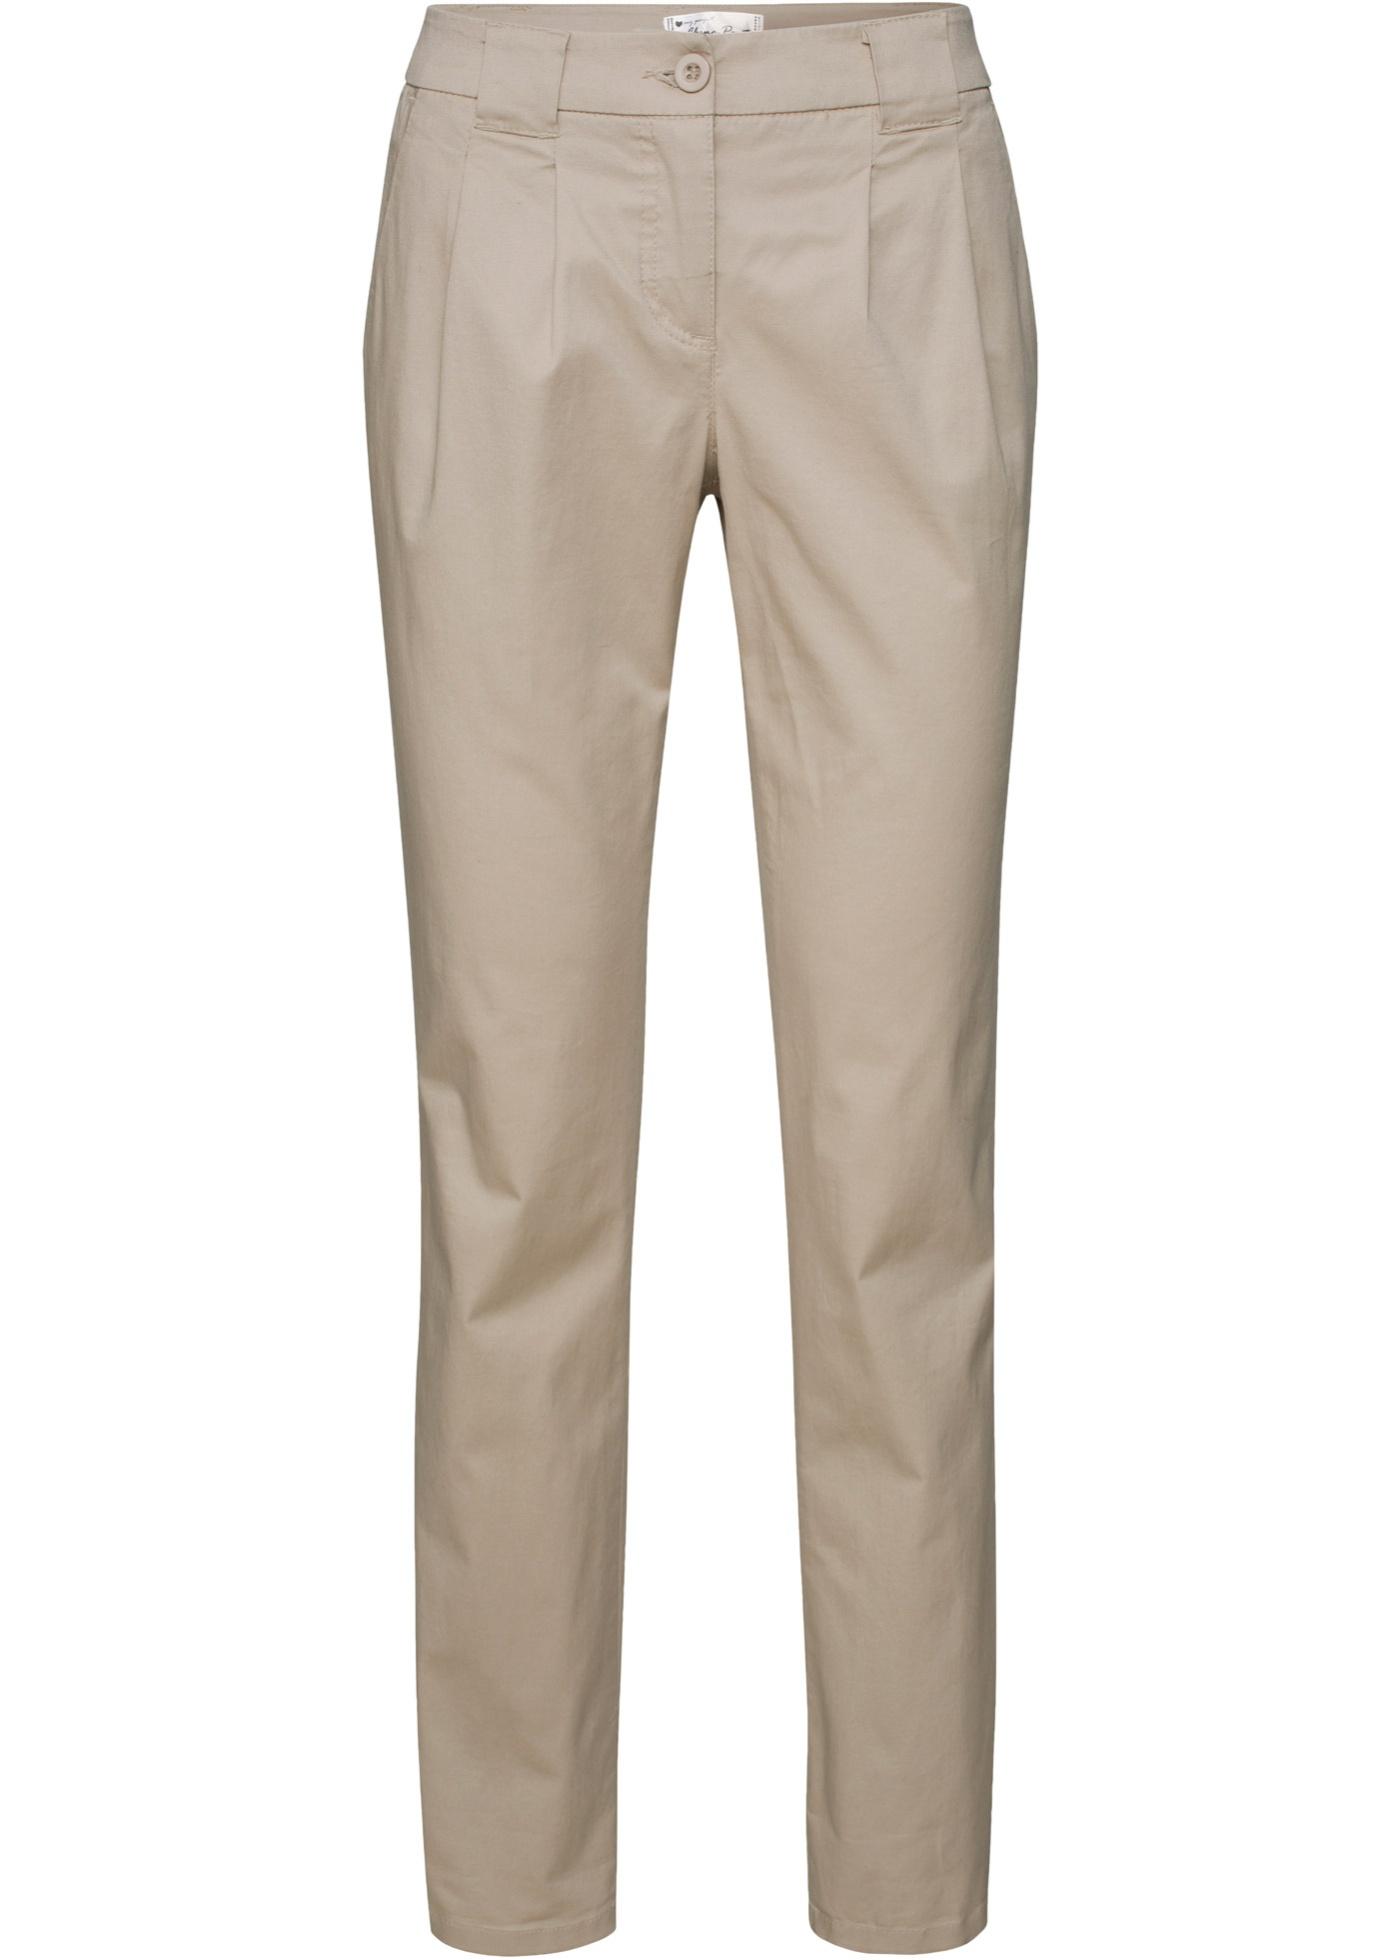 Hosen - Stretch Chinohose › bonprix › beige  - Onlineshop Bonprix